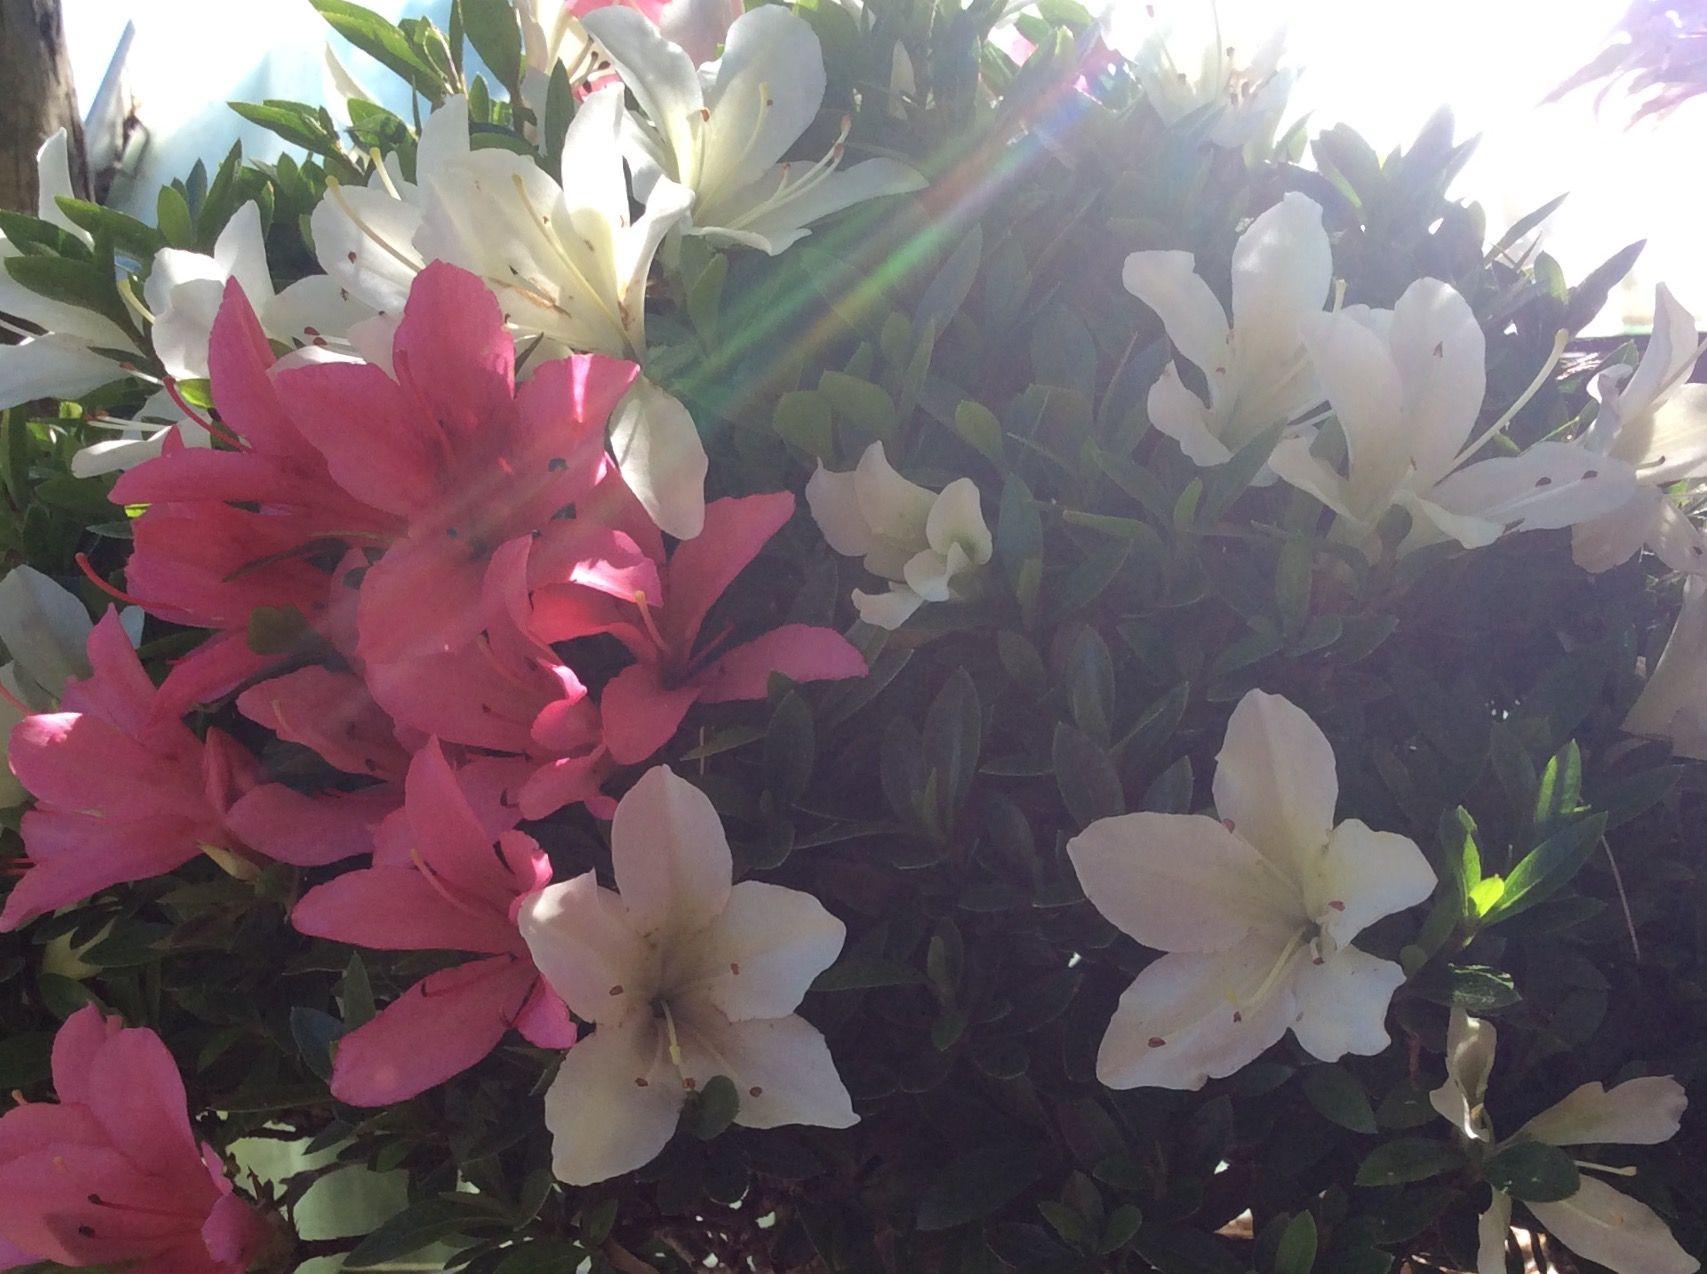 Satsuki Azalea Bonsai Pink And White Flowers On The Same Tree All